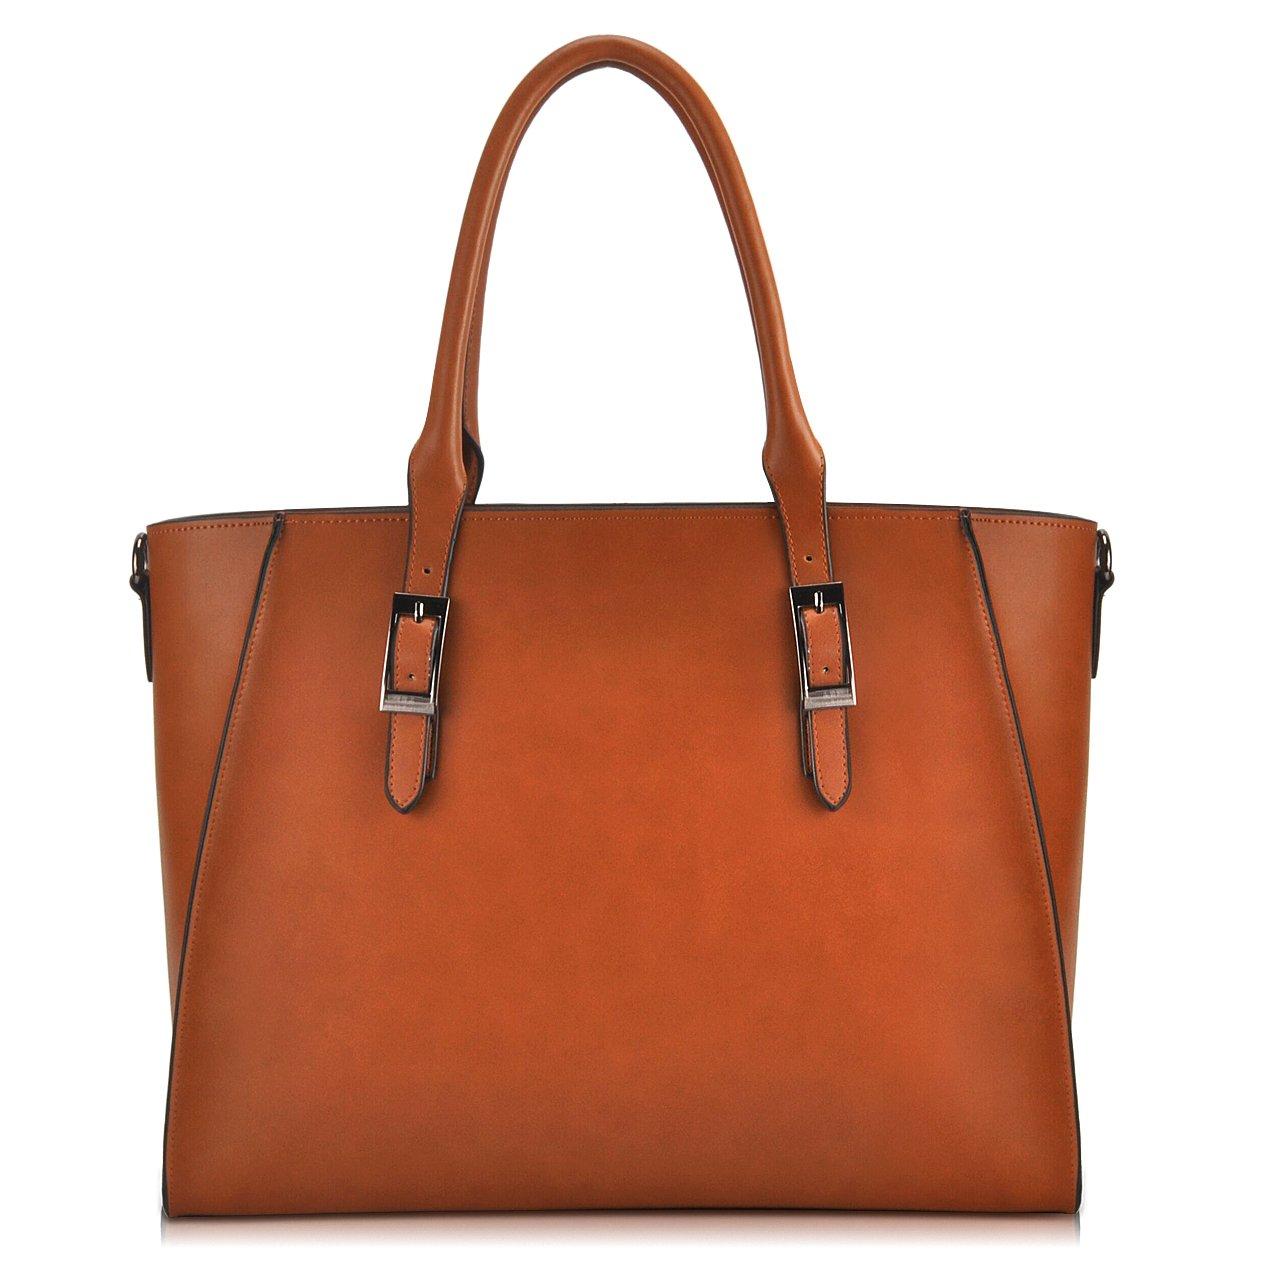 IAITU Laptop Tote Bag,15.6 Inch Crossbody Laptop Bag Casual Work Business Handbag with Smooth Zipper for Women(Brown) by IAITU (Image #2)